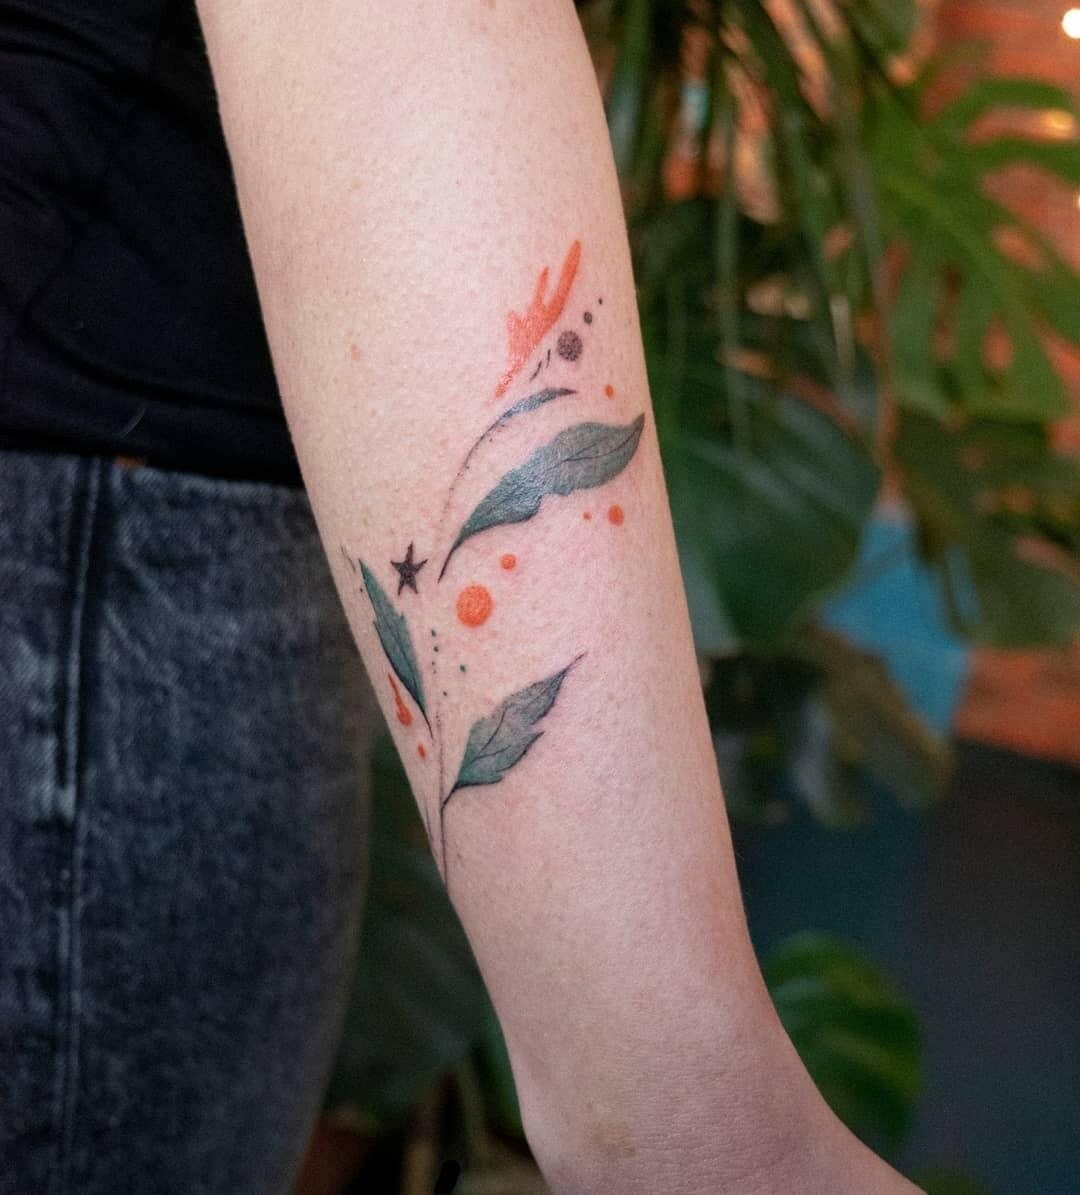 Inksearch tattoo Ula Mierzwa